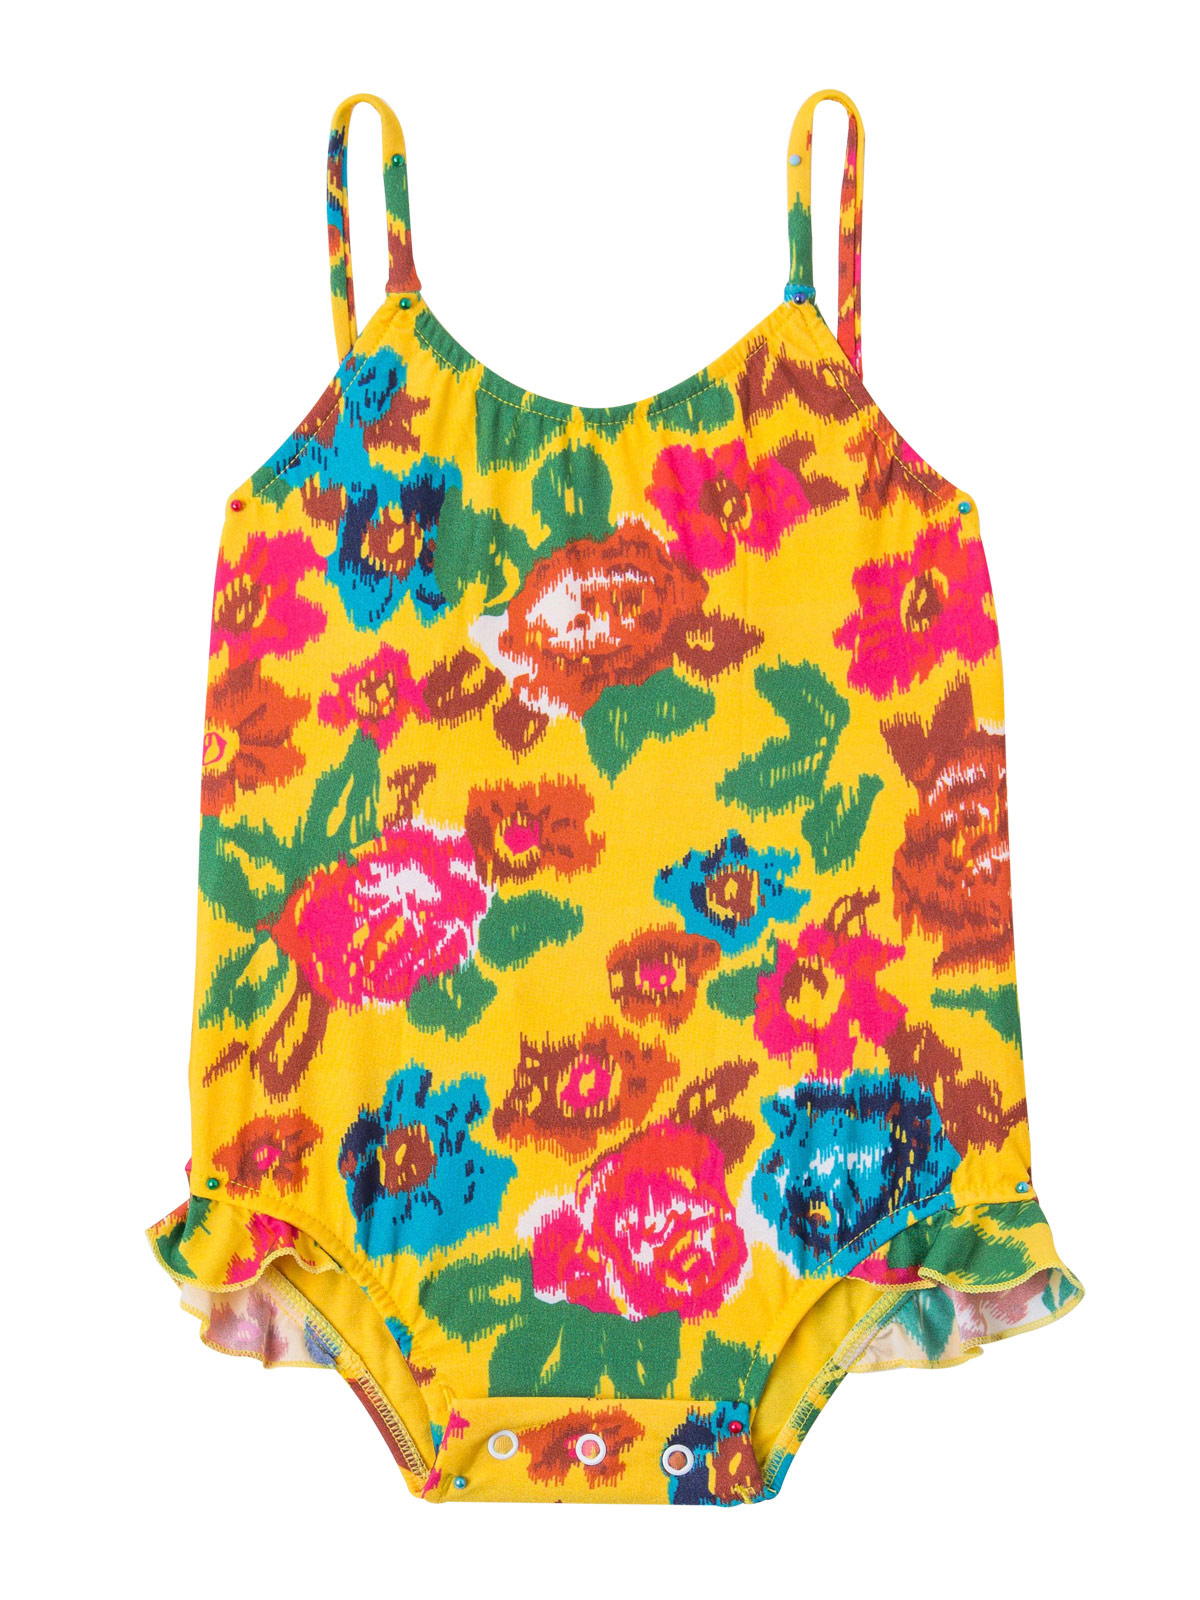 71045f253d4 Ολόσωμο βρεφικό μαγιό, κίτρινο με λουλούδια - Melody Baby - Salinas